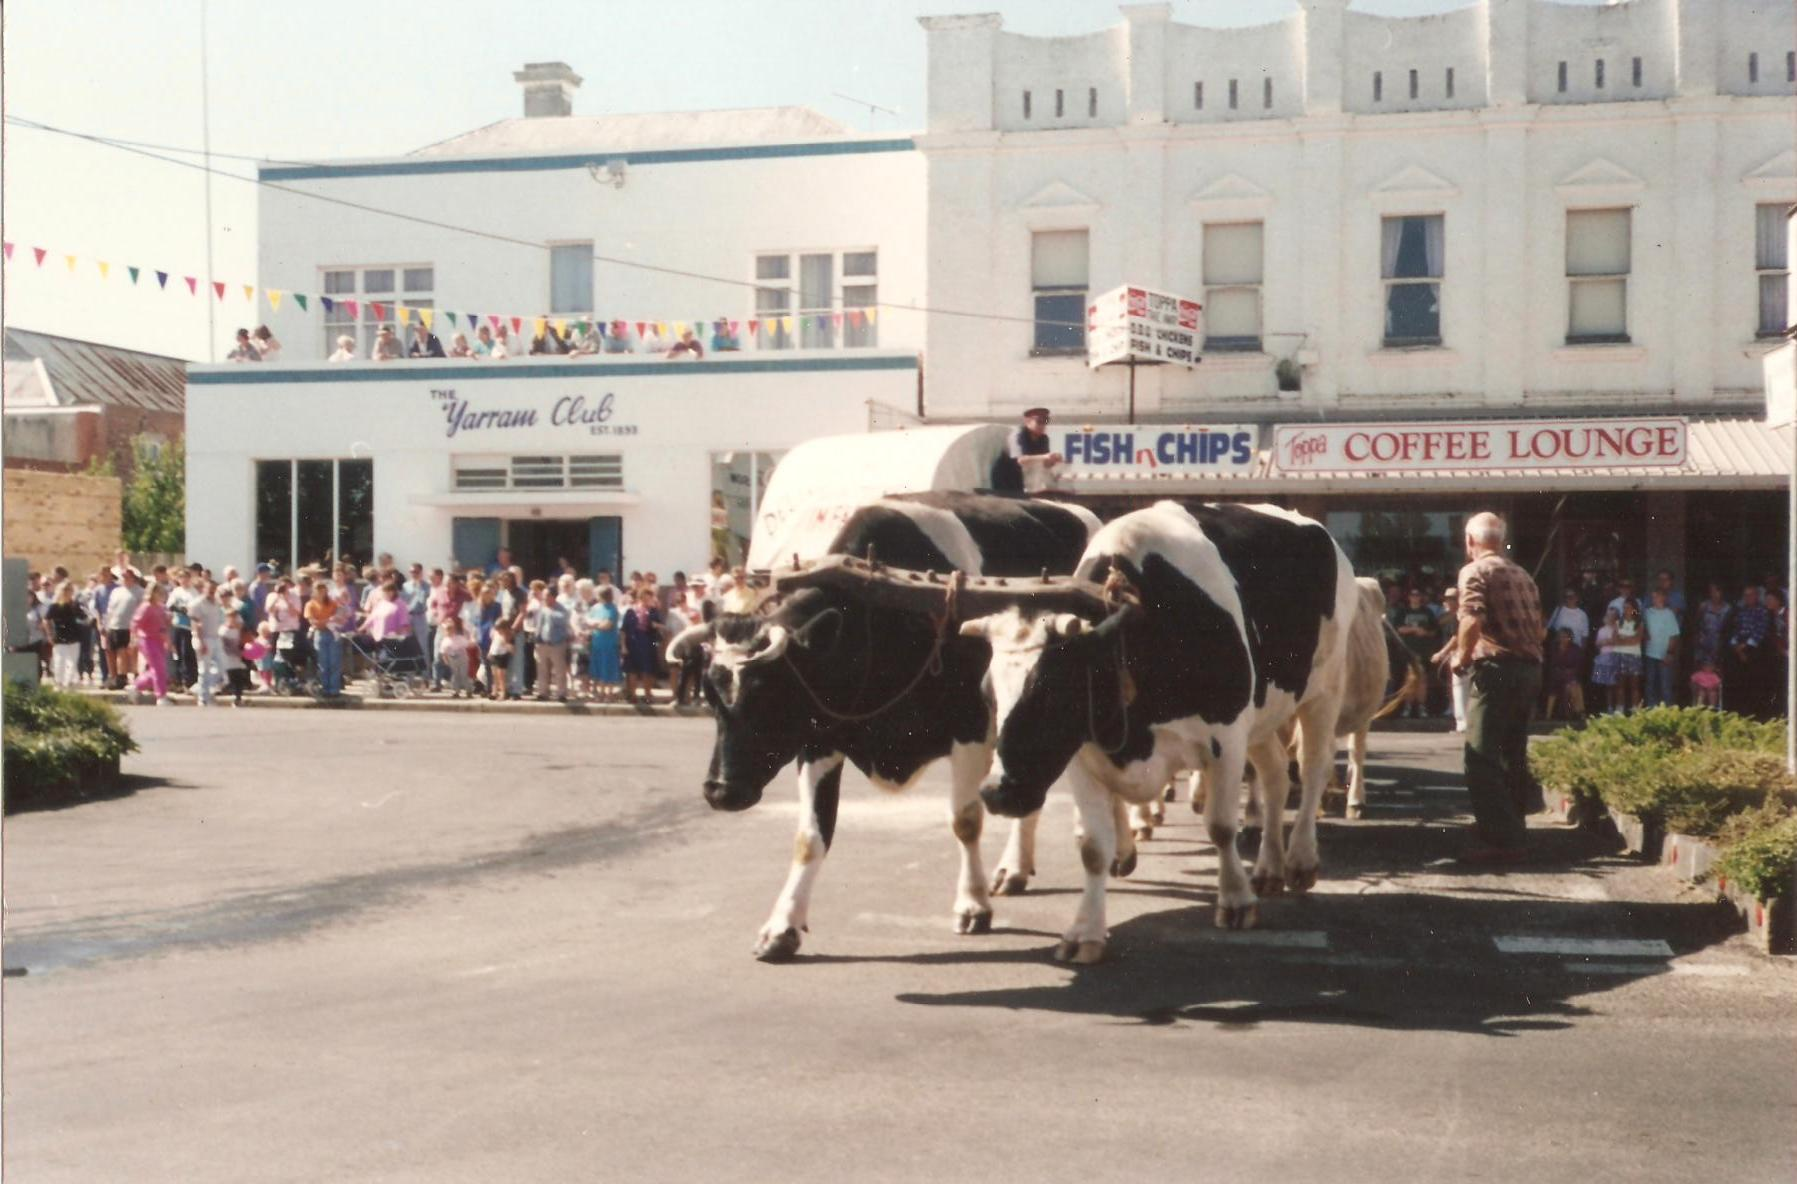 Bullock team at Yarram, Victoria